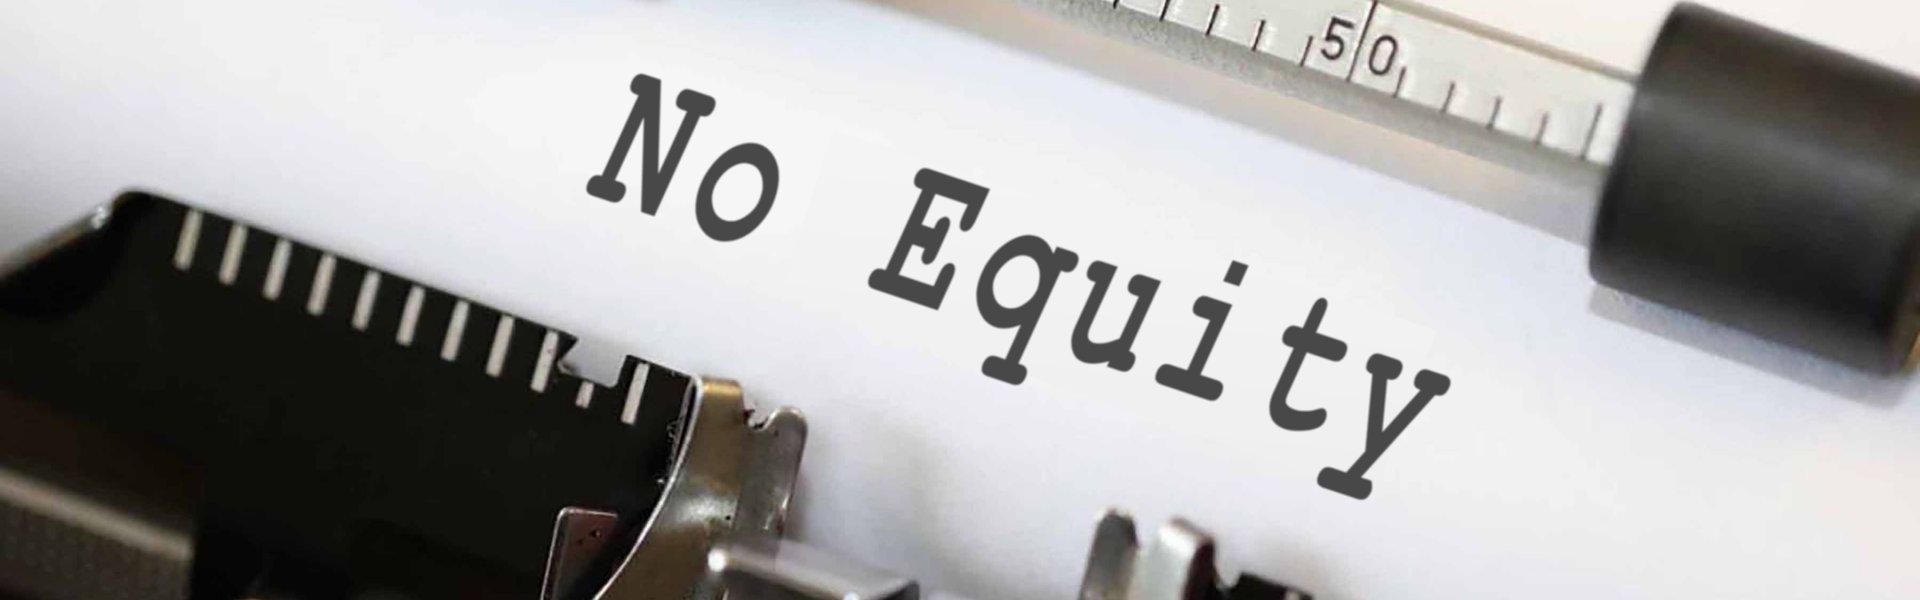 No Equity House Sale